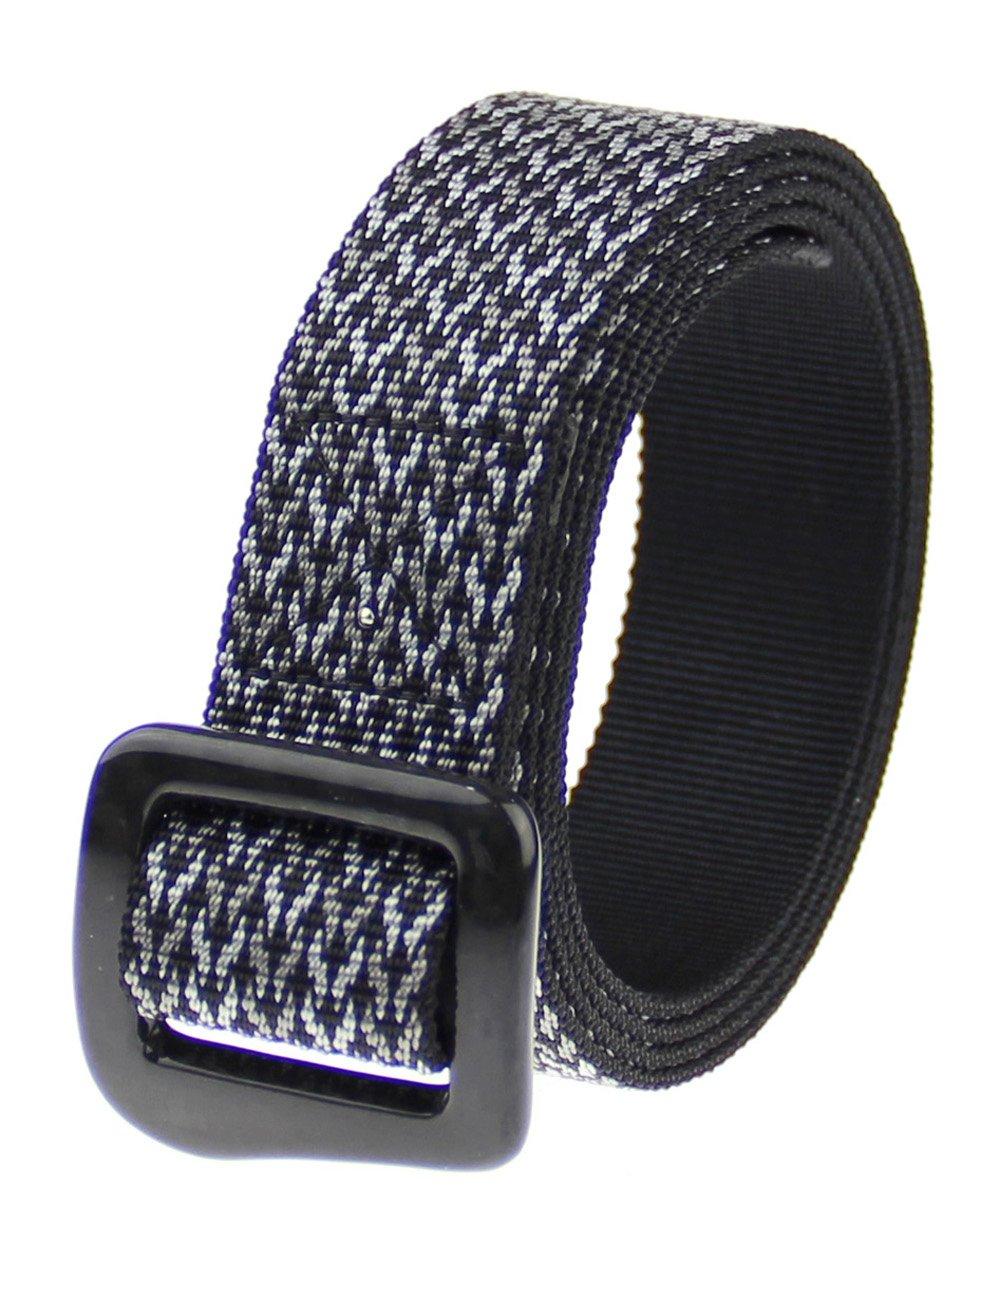 RockWay Ourdoor Jacquard Nylon with Carbon Fiber Buckle Unisex Cycling Belt (Black) (Medium)